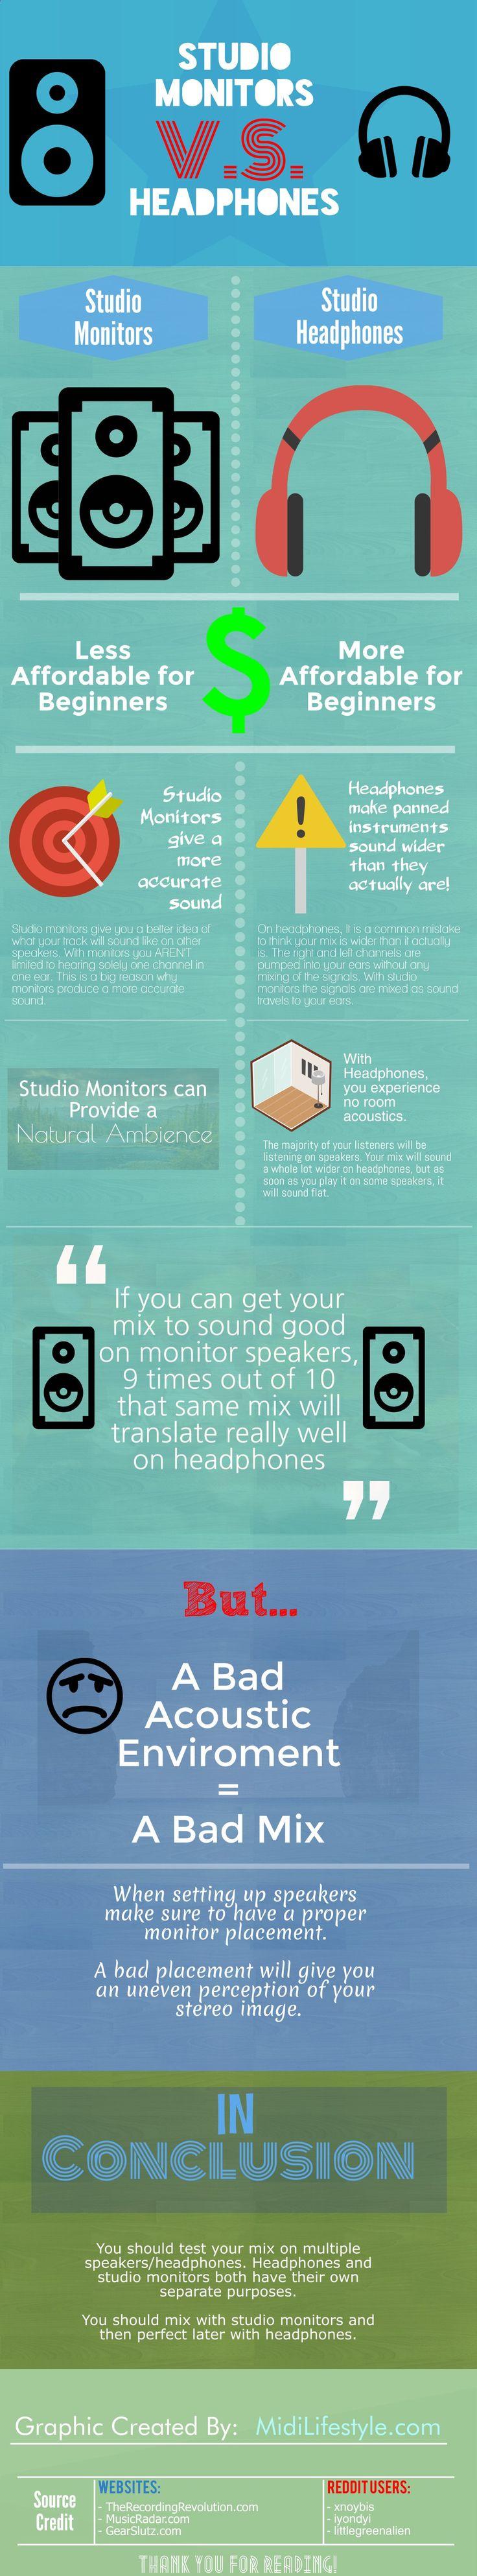 headphones vs studio monitorshttp://www.midilifestyle.com/blog/studio-monitors-vs-headphones-what-is-the-best-option/